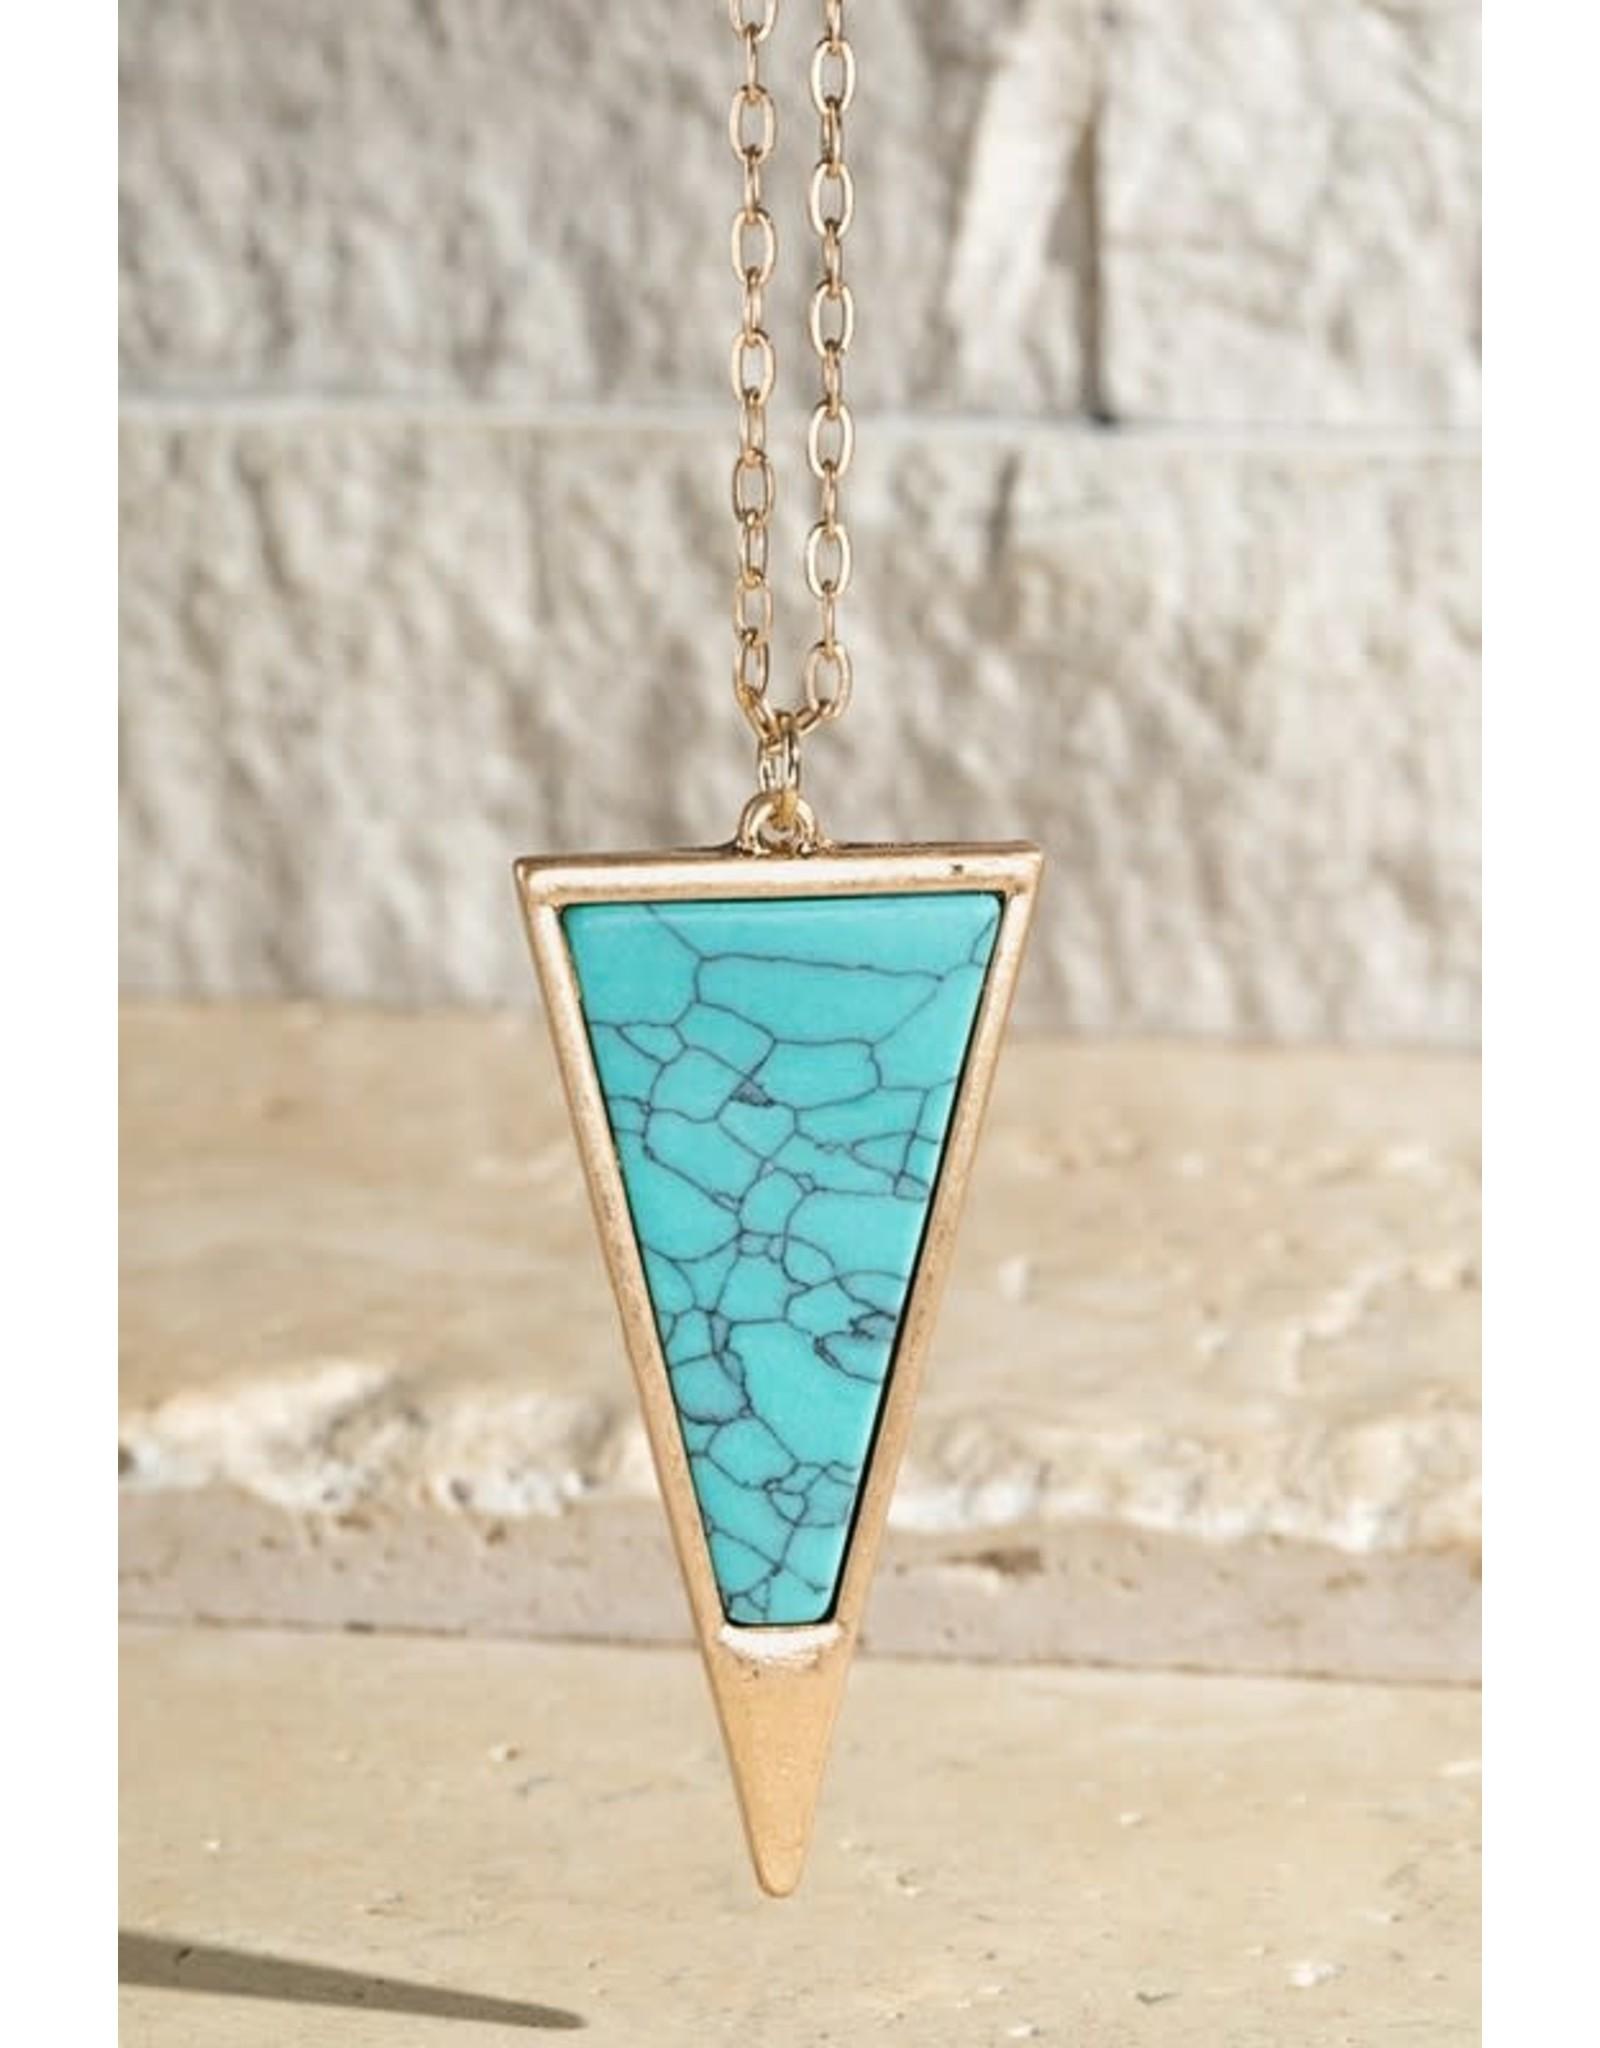 Stone Triangular Pendant Necklace